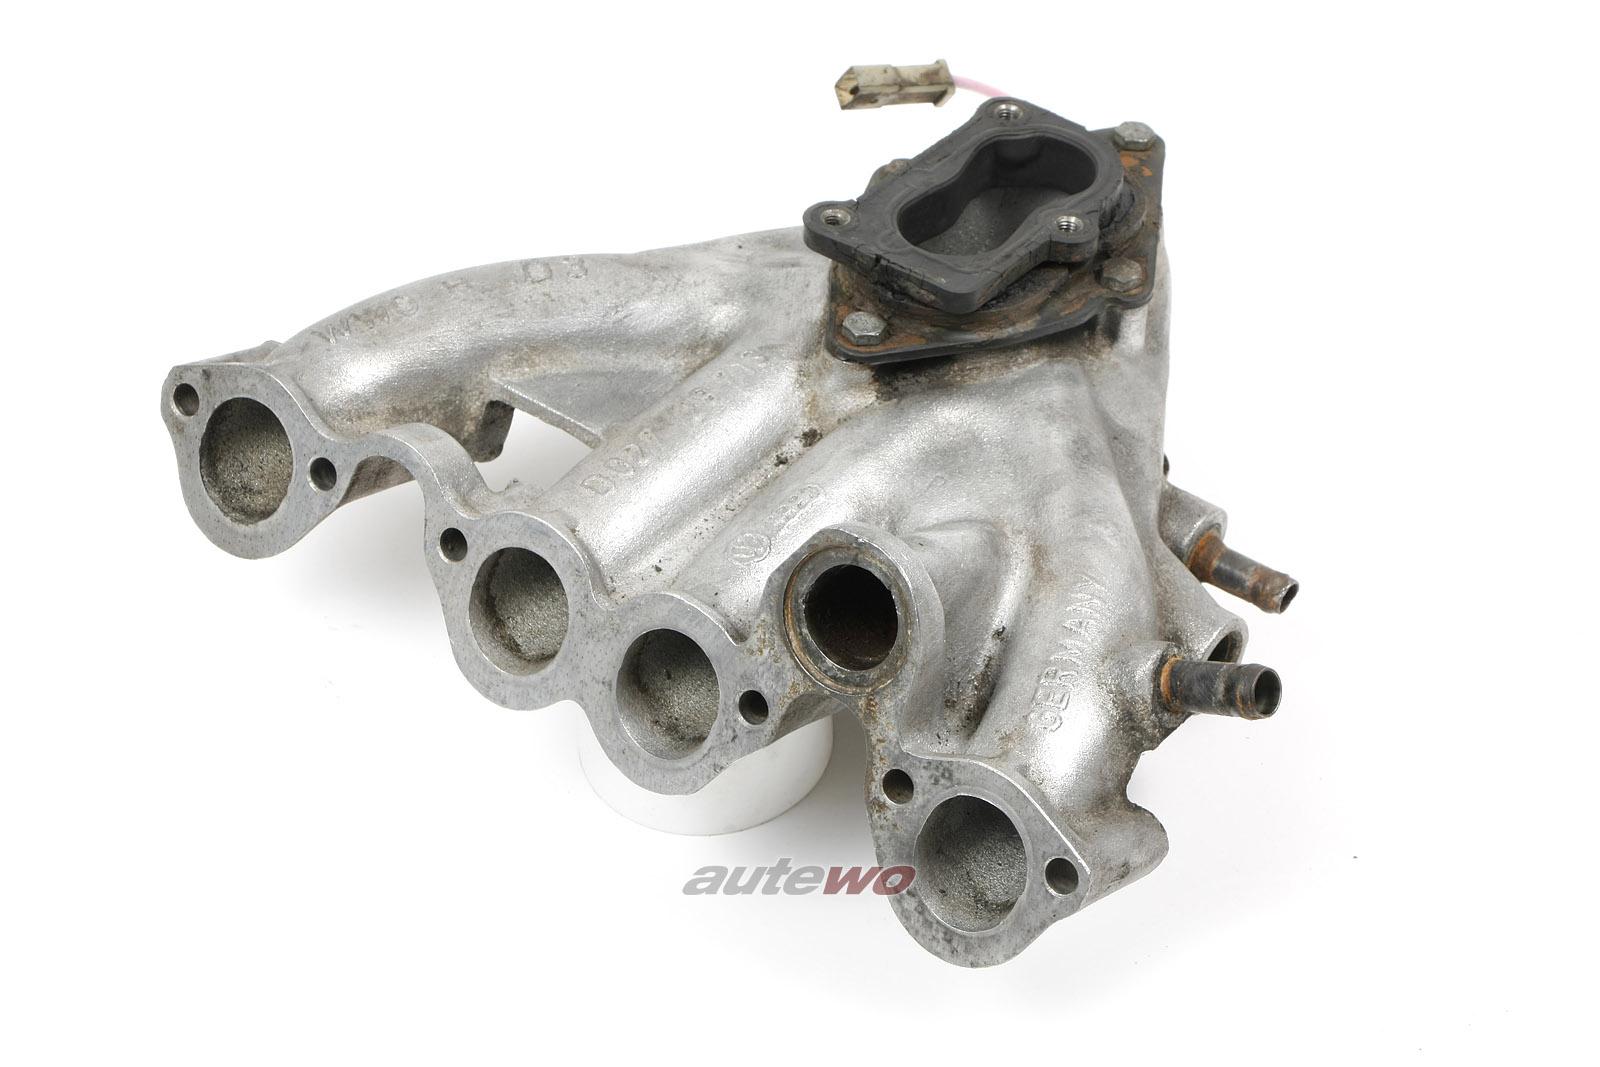 027129711B 027129713 Audi/VW 80 Typ 81 1.3/1.6l 4 Zylinder DT/EP Saugrohr